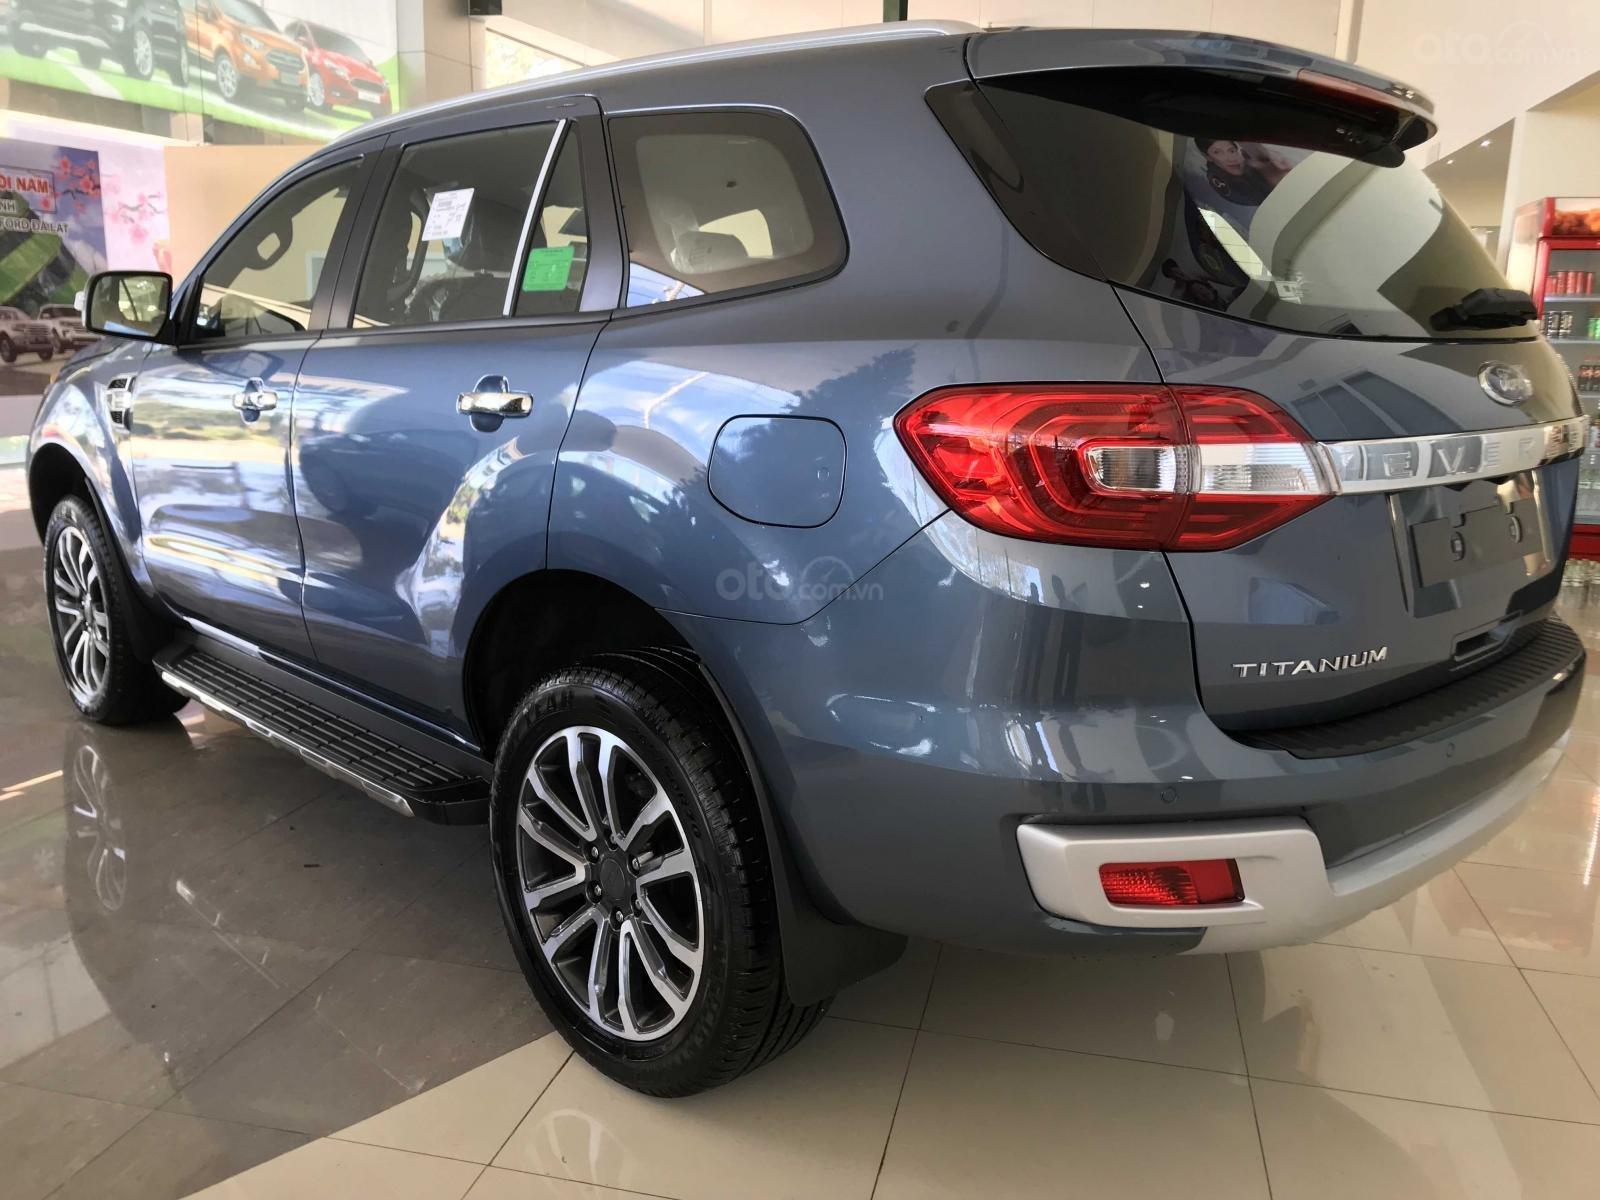 Ford Everest Titanium 2019 nhập khẩu giá tốt nhất (5)